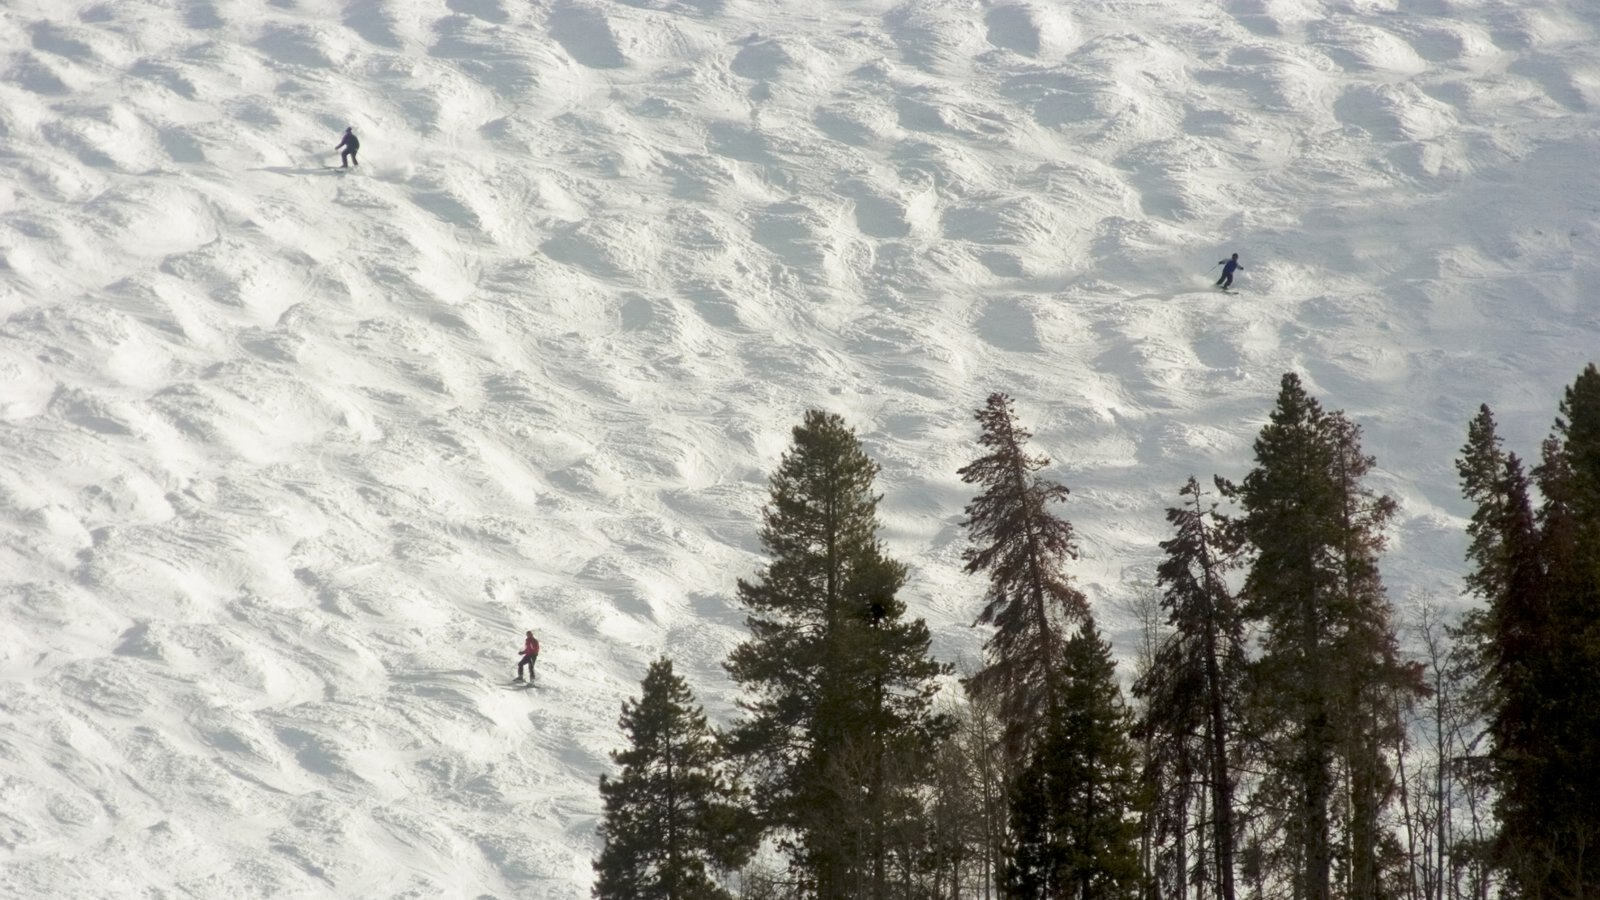 Vail Ski Resort mostrando esqui na neve e neve